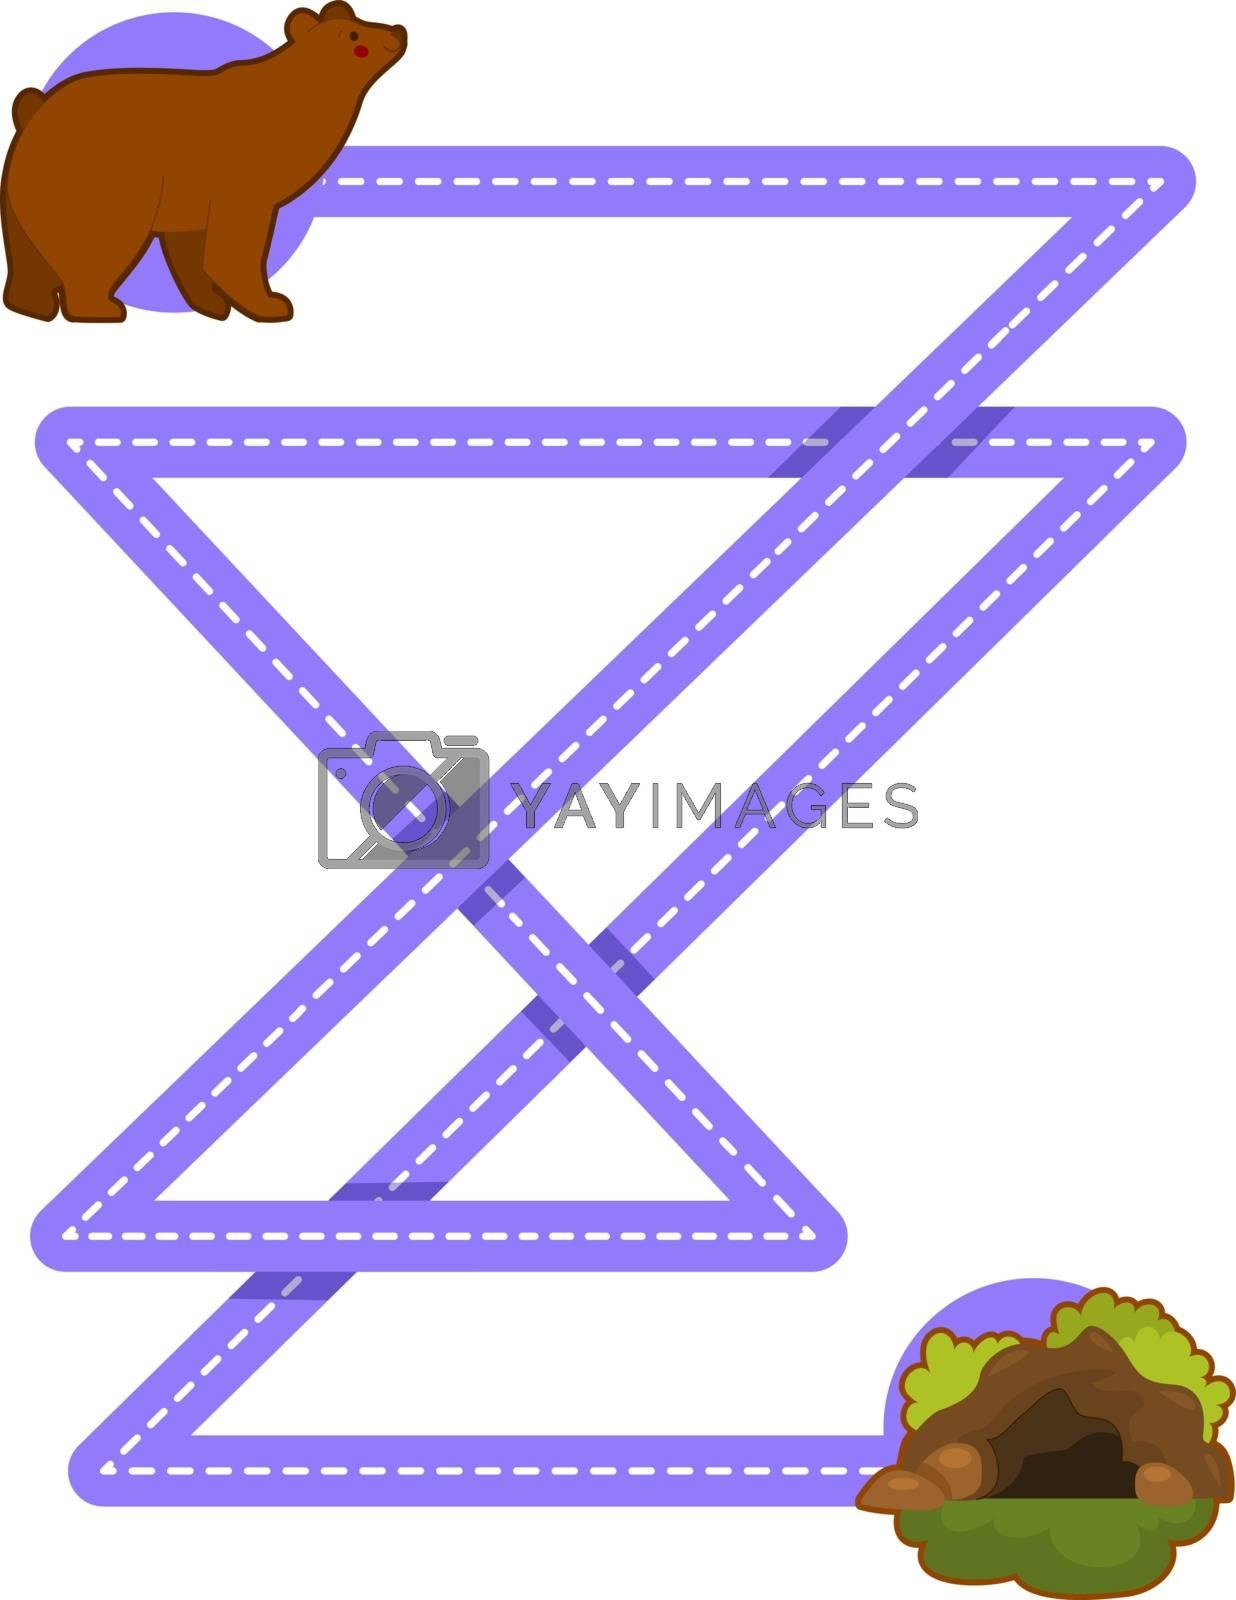 Educational printable games for the development of fine motor skills in kids. Baby's finger allow along the tracks. Vector illustration